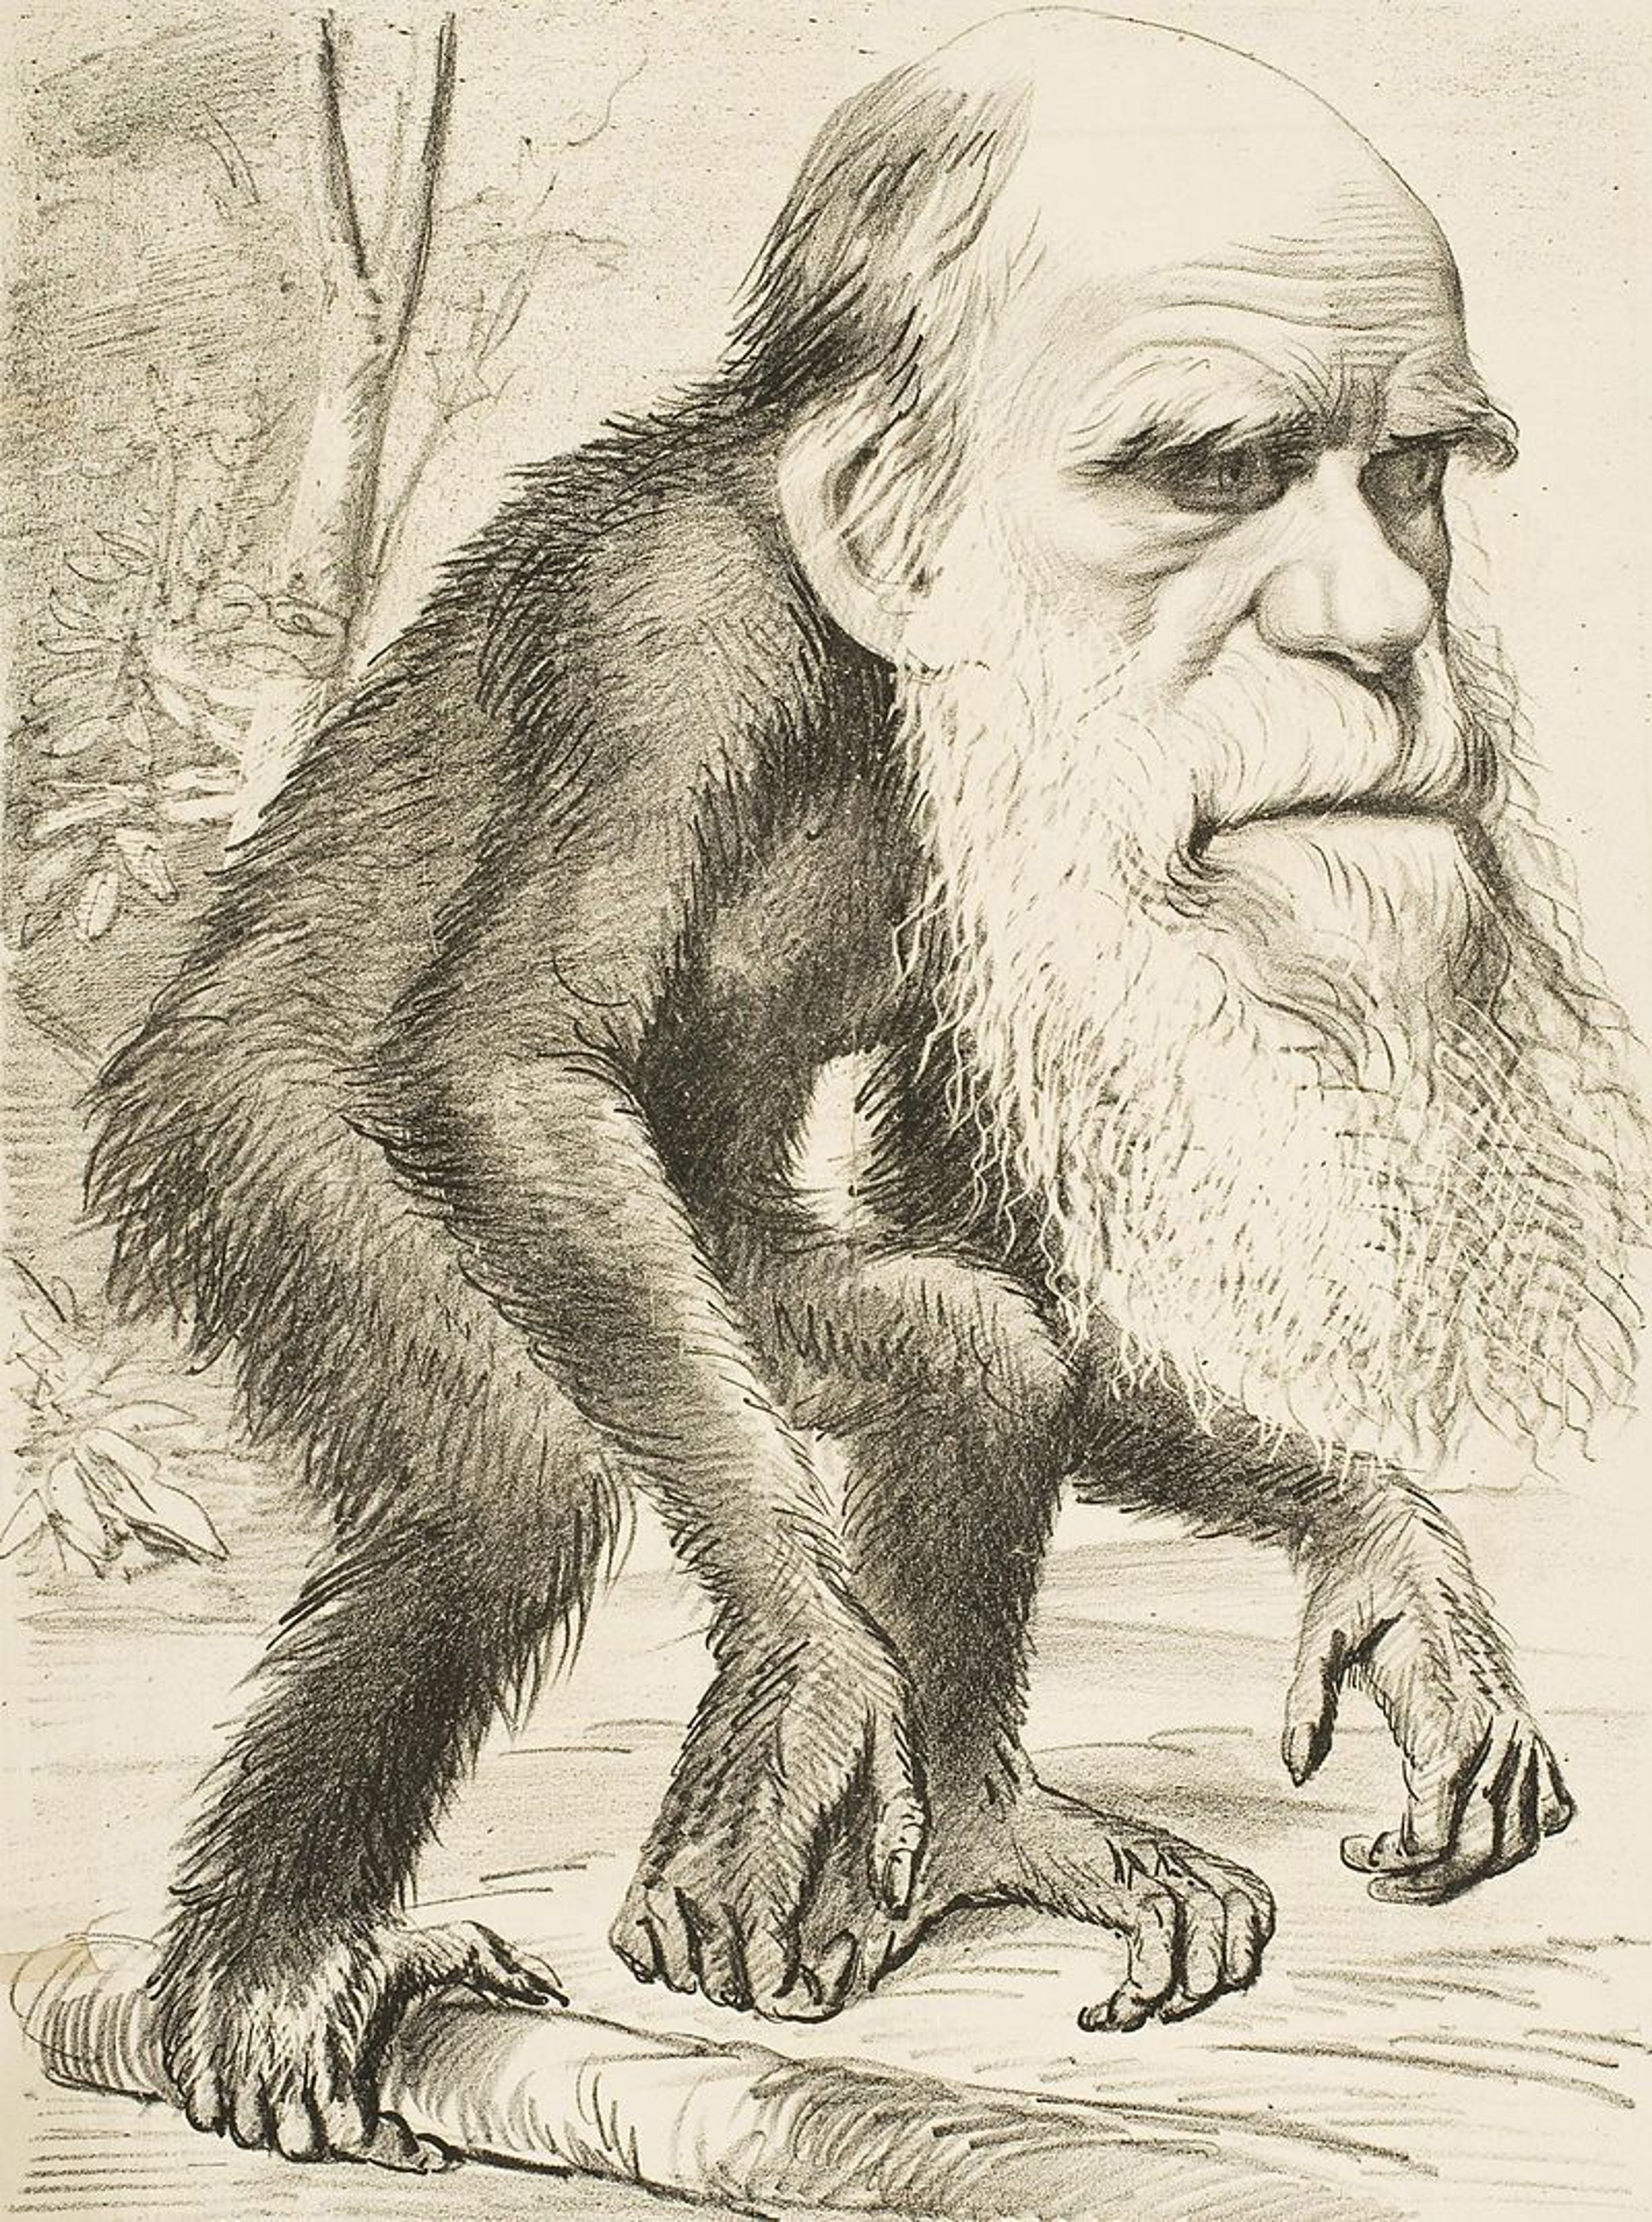 Editorial_cartoon_depicting_Charles_Darwin_as_an_ape_1871_as.jpg